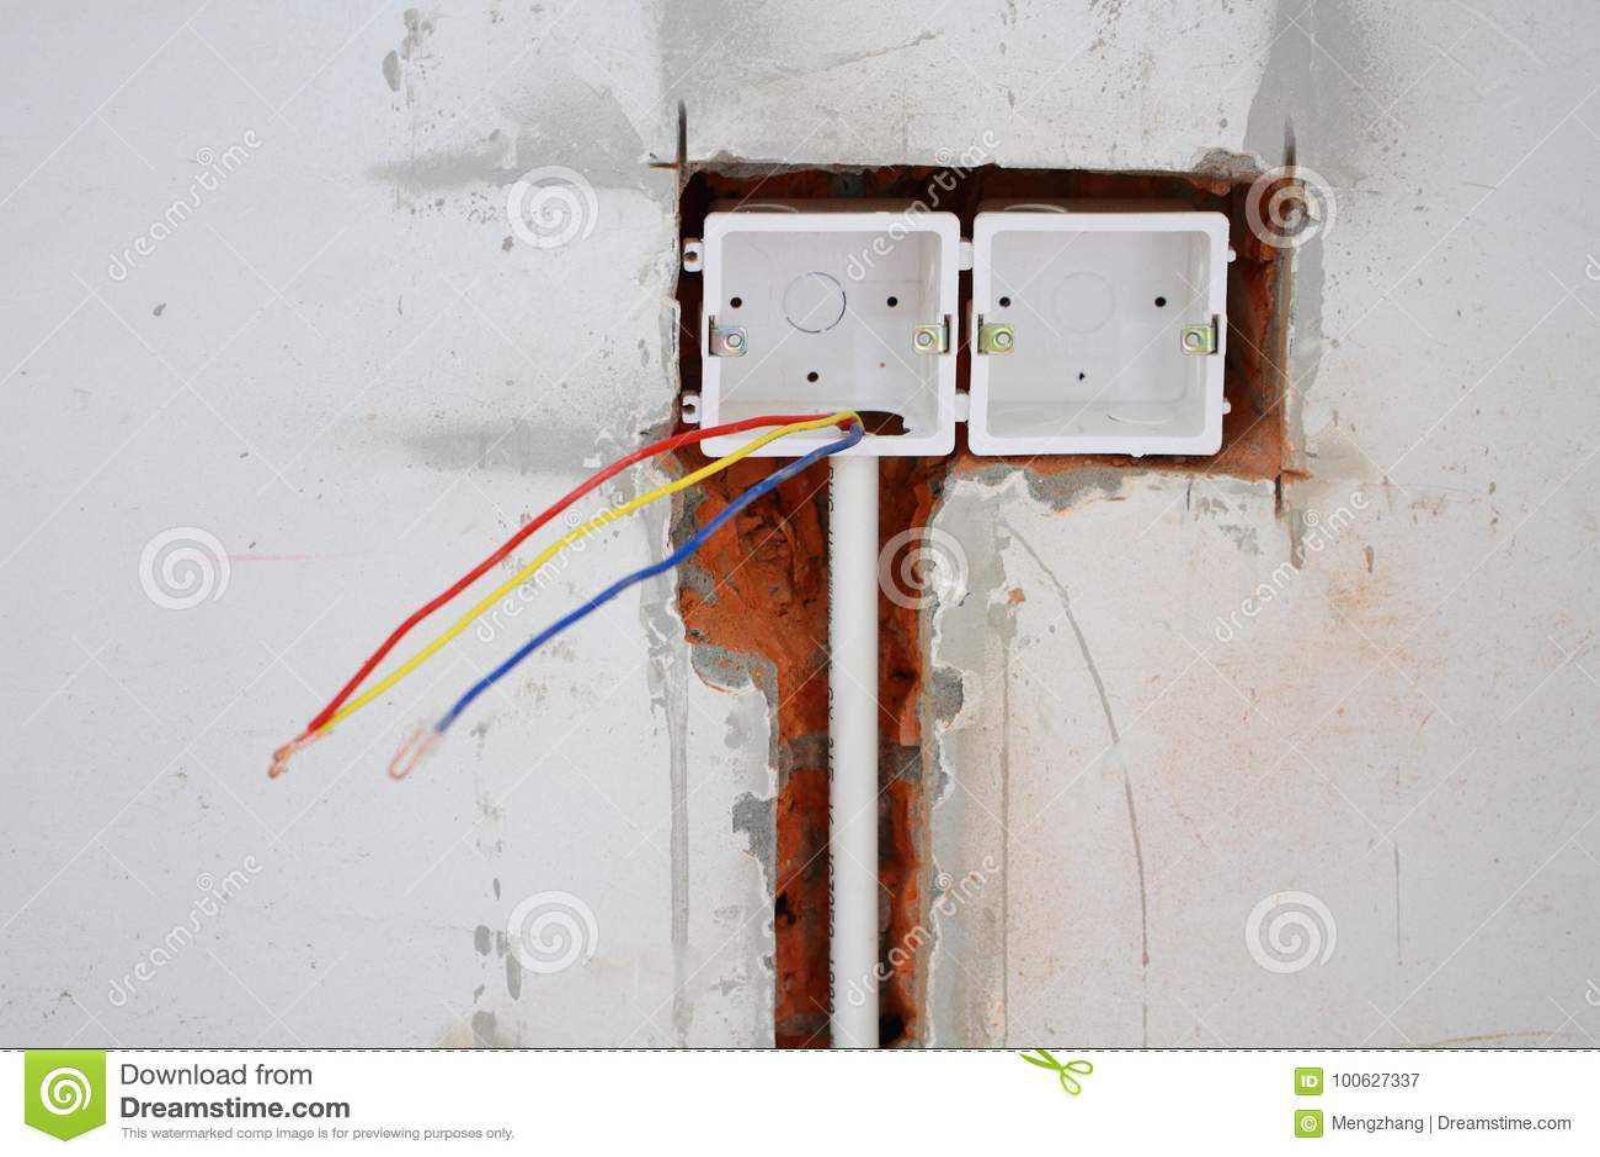 Electrical renovation work stock image. Image of hanging - 100627337